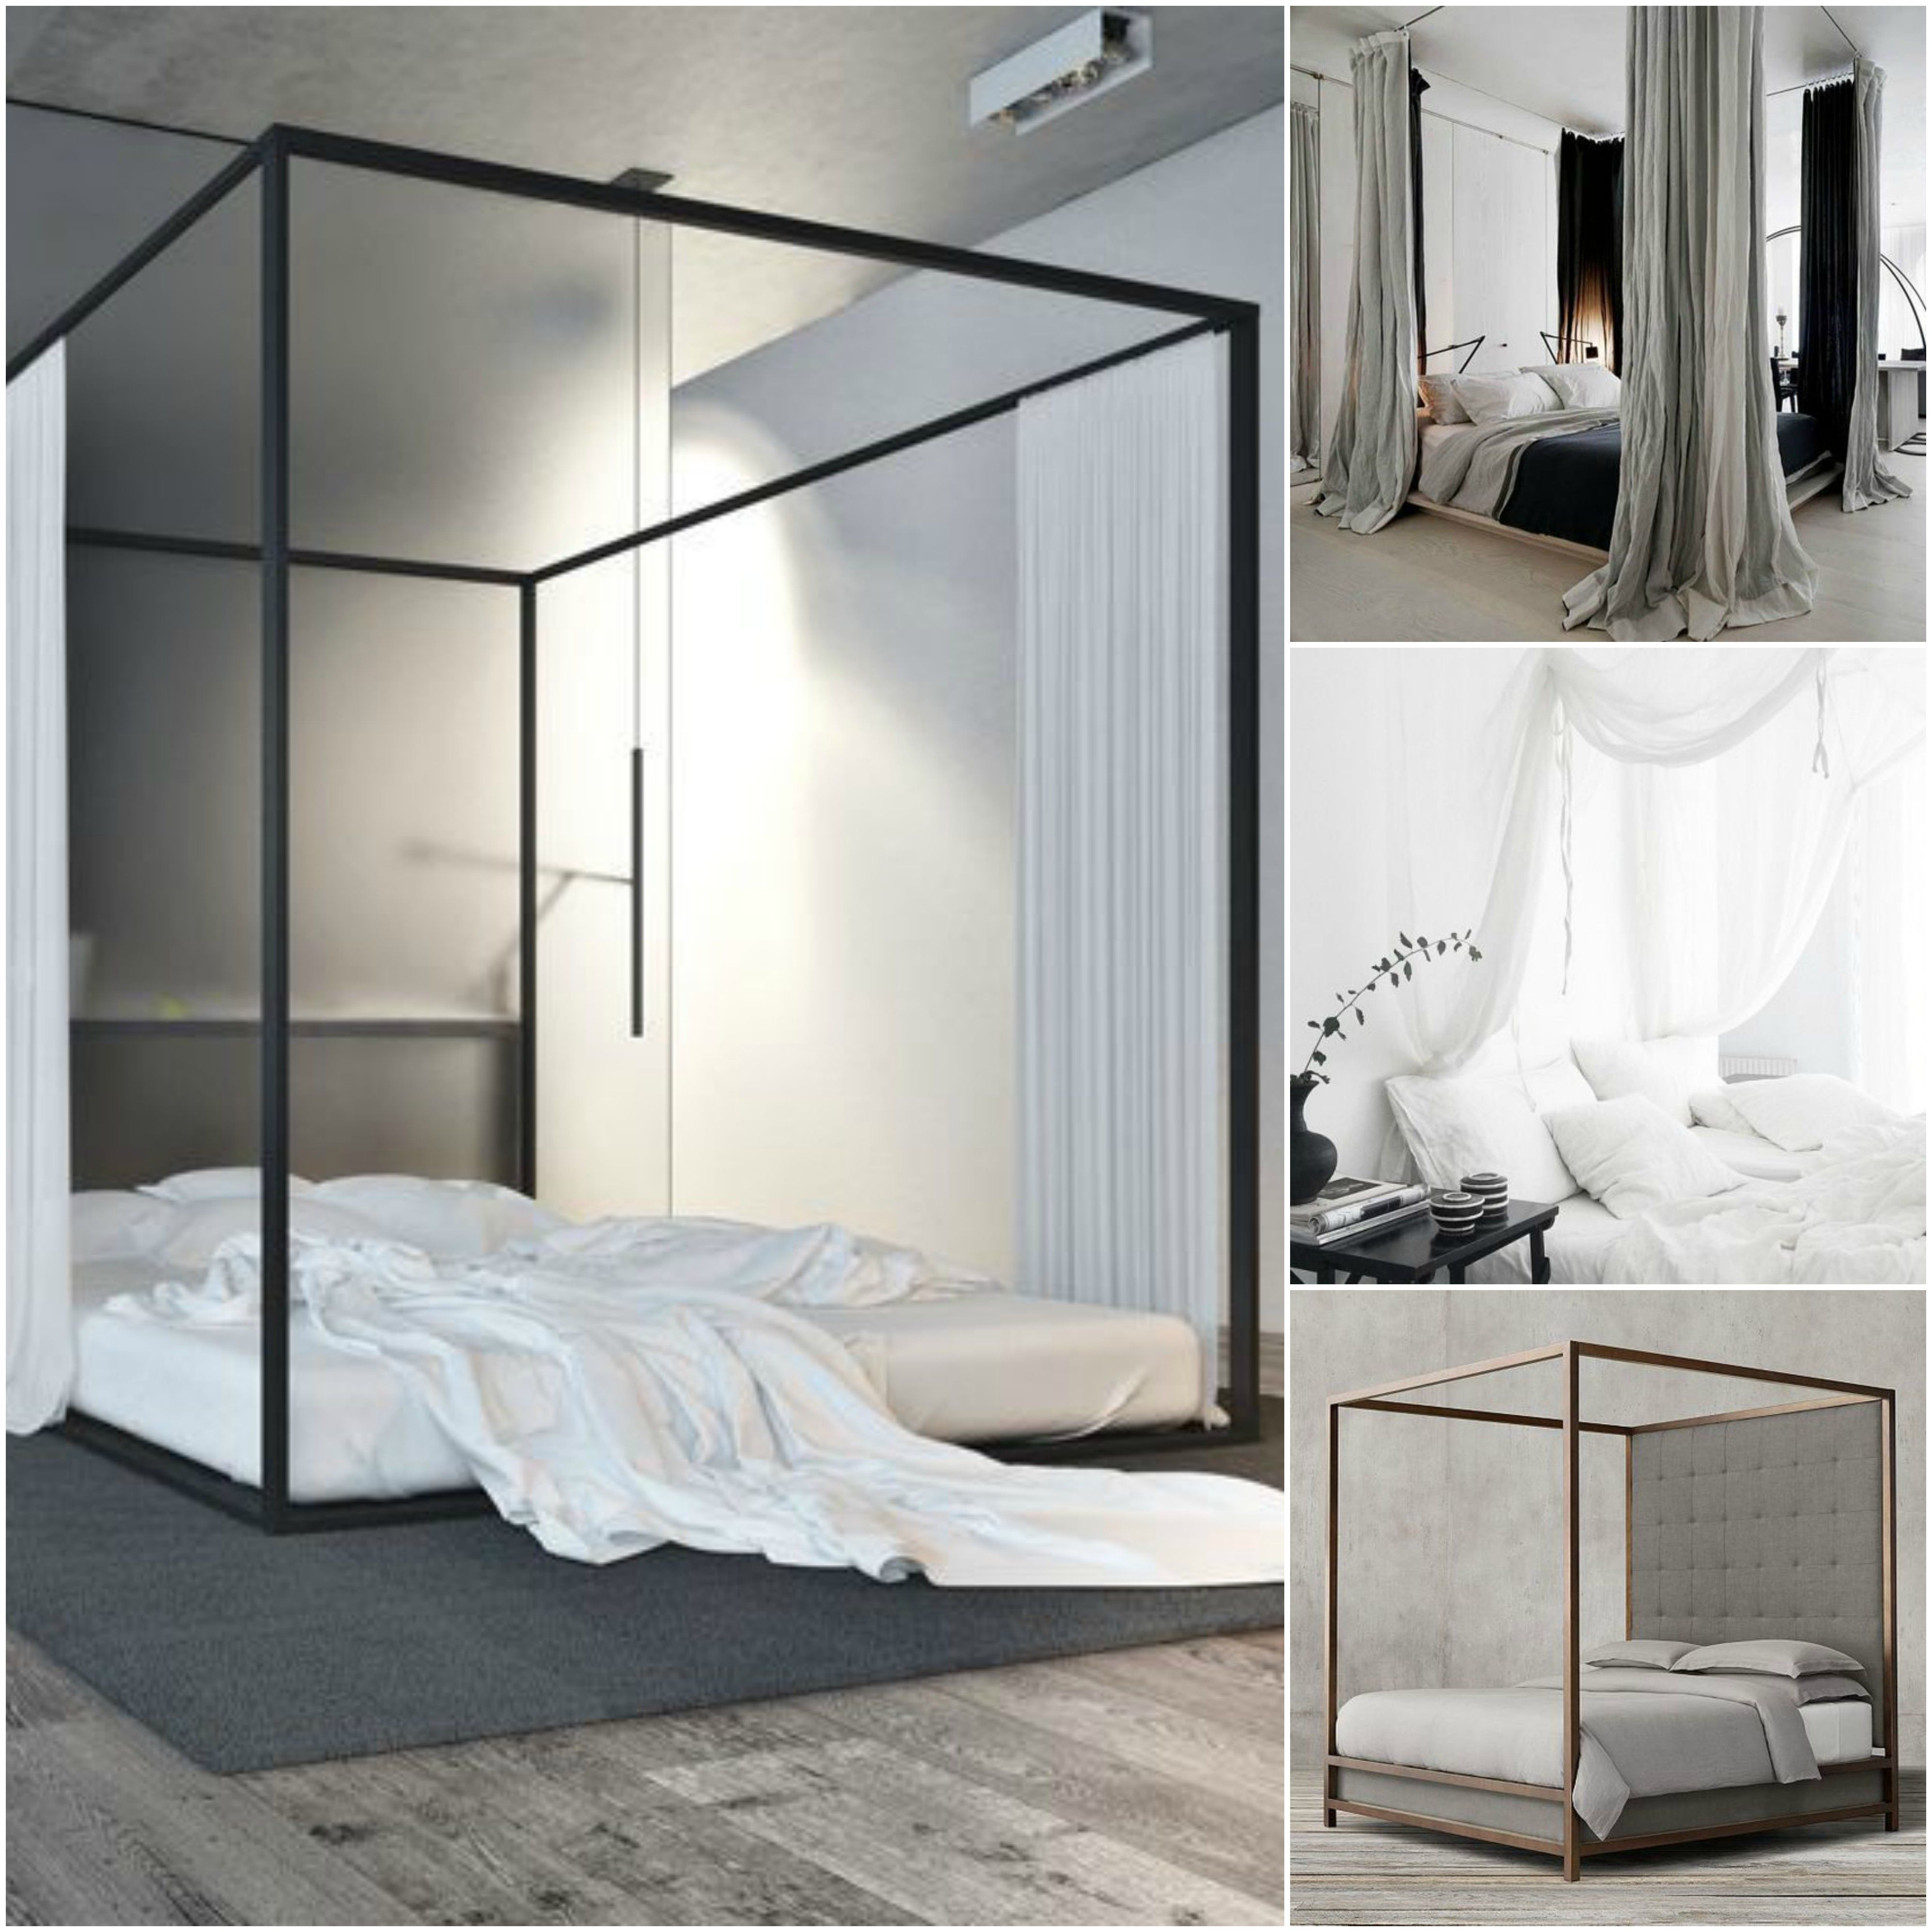 fourposterbed #hemelbed #modern #curtains #gordijnen #linen #linnen ...